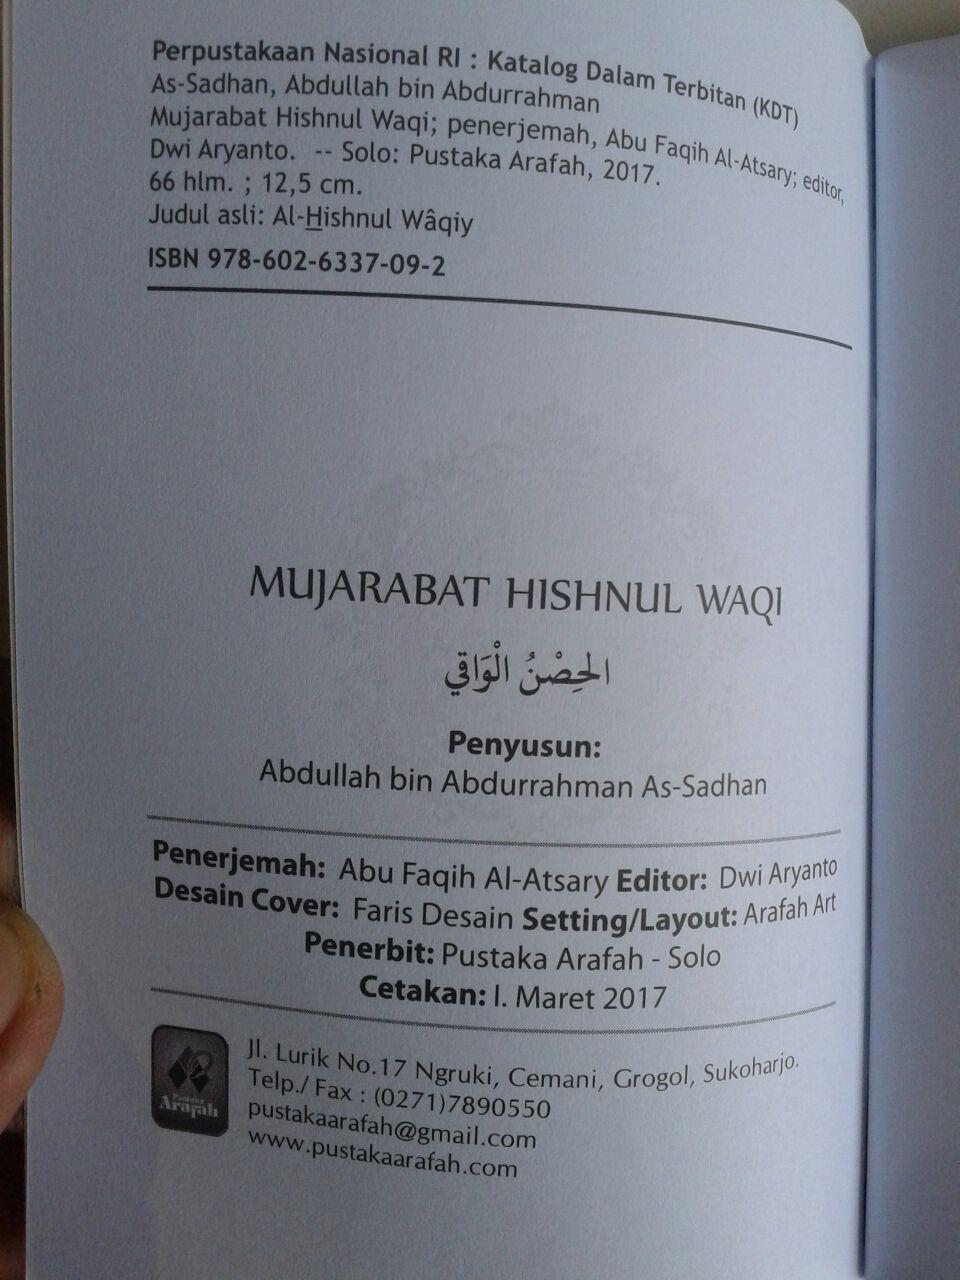 Buku Saku Mujarabat Hisnul Waqi Doa Dzikir Dari Keburukan isi